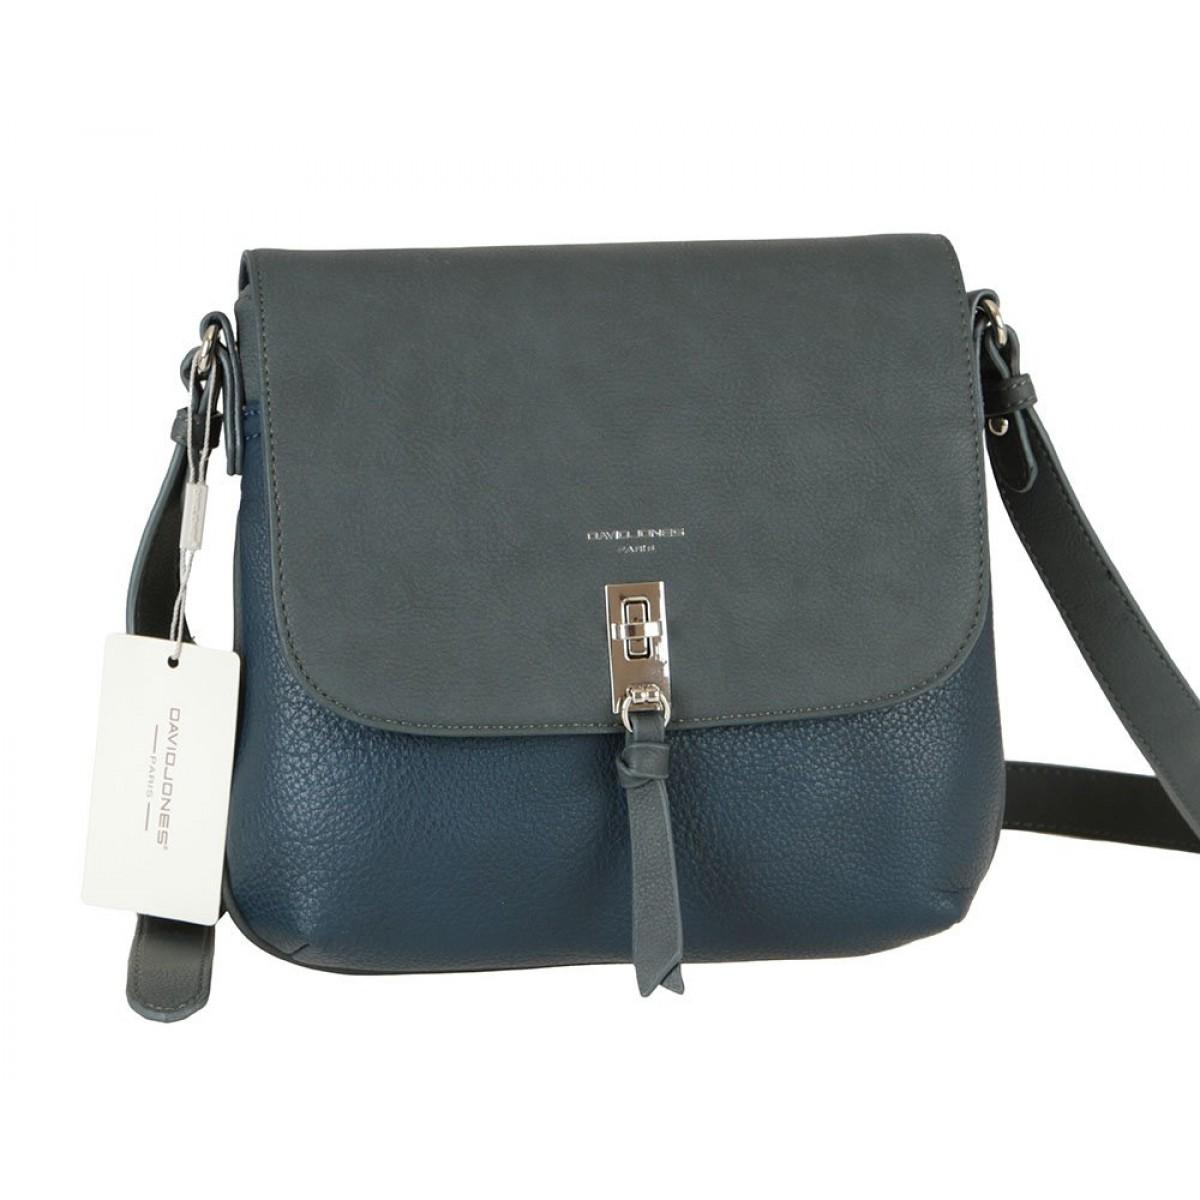 Жіноча сумка David Jones 6425-1 D.BLUE